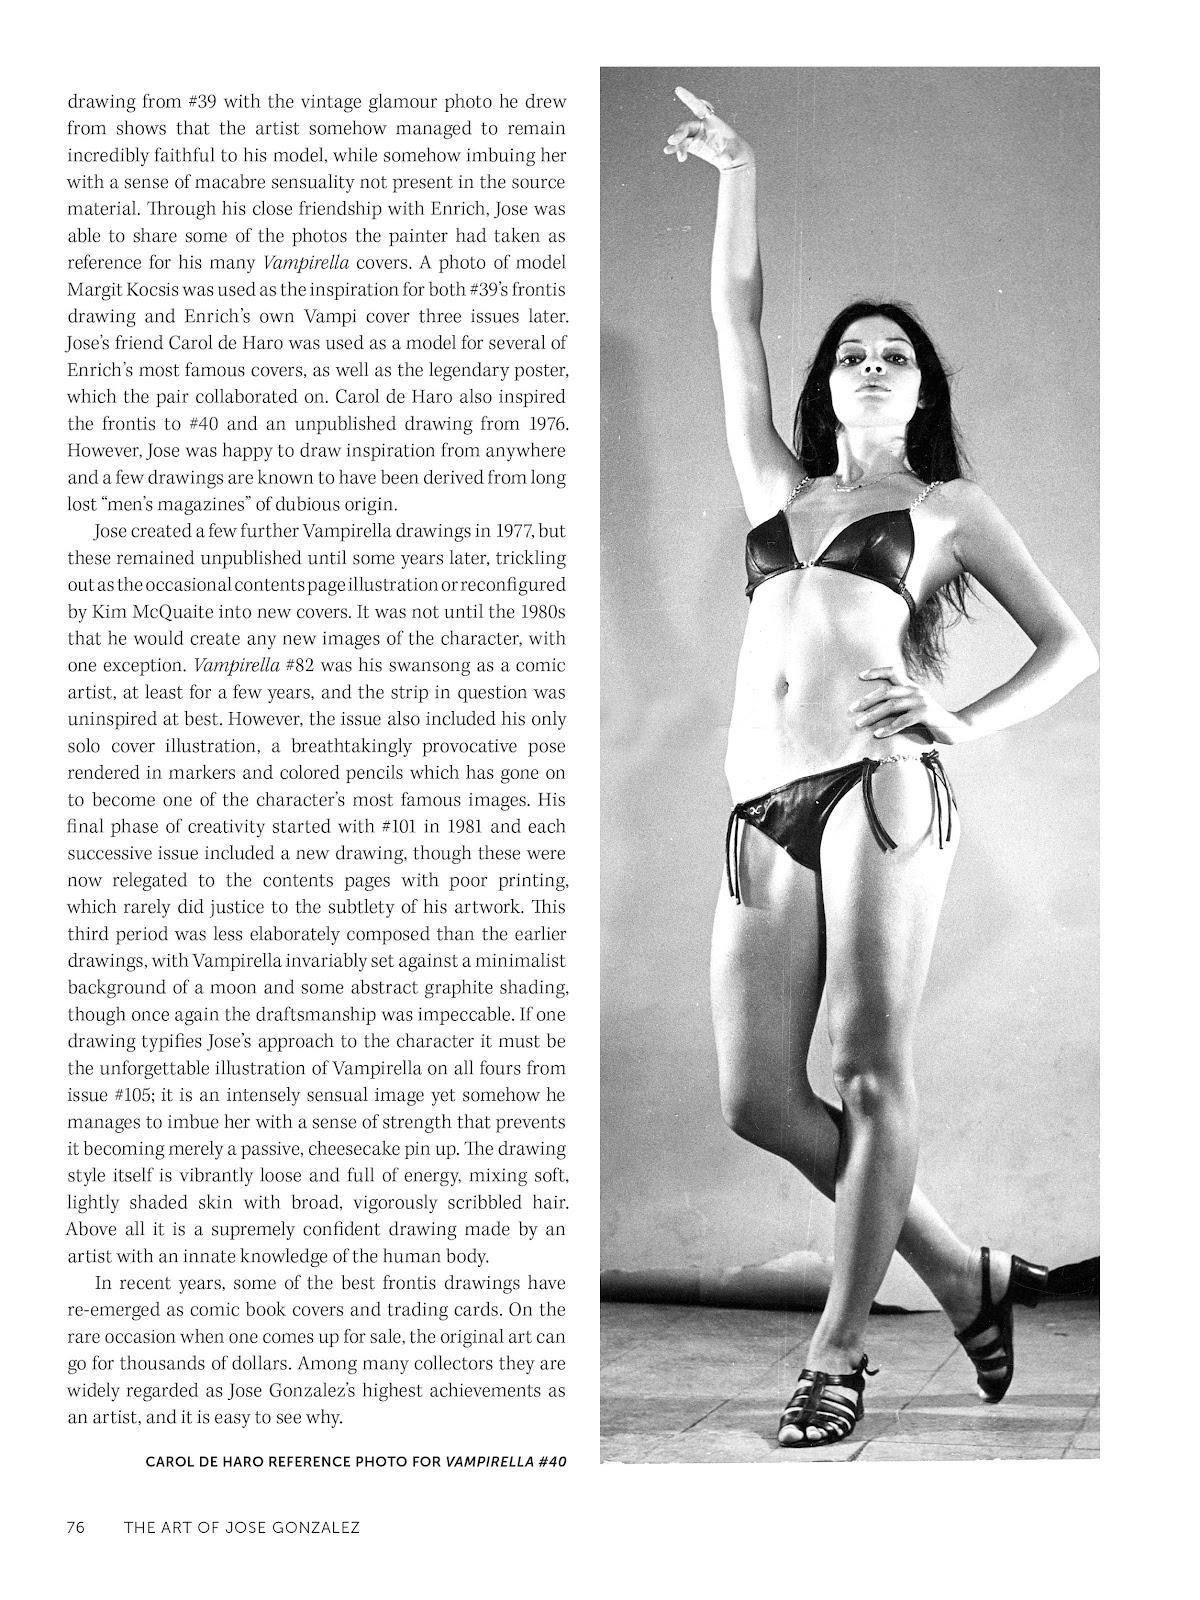 Read online The Art of Jose Gonzalez comic -  Issue # TPB (Part 1) - 77